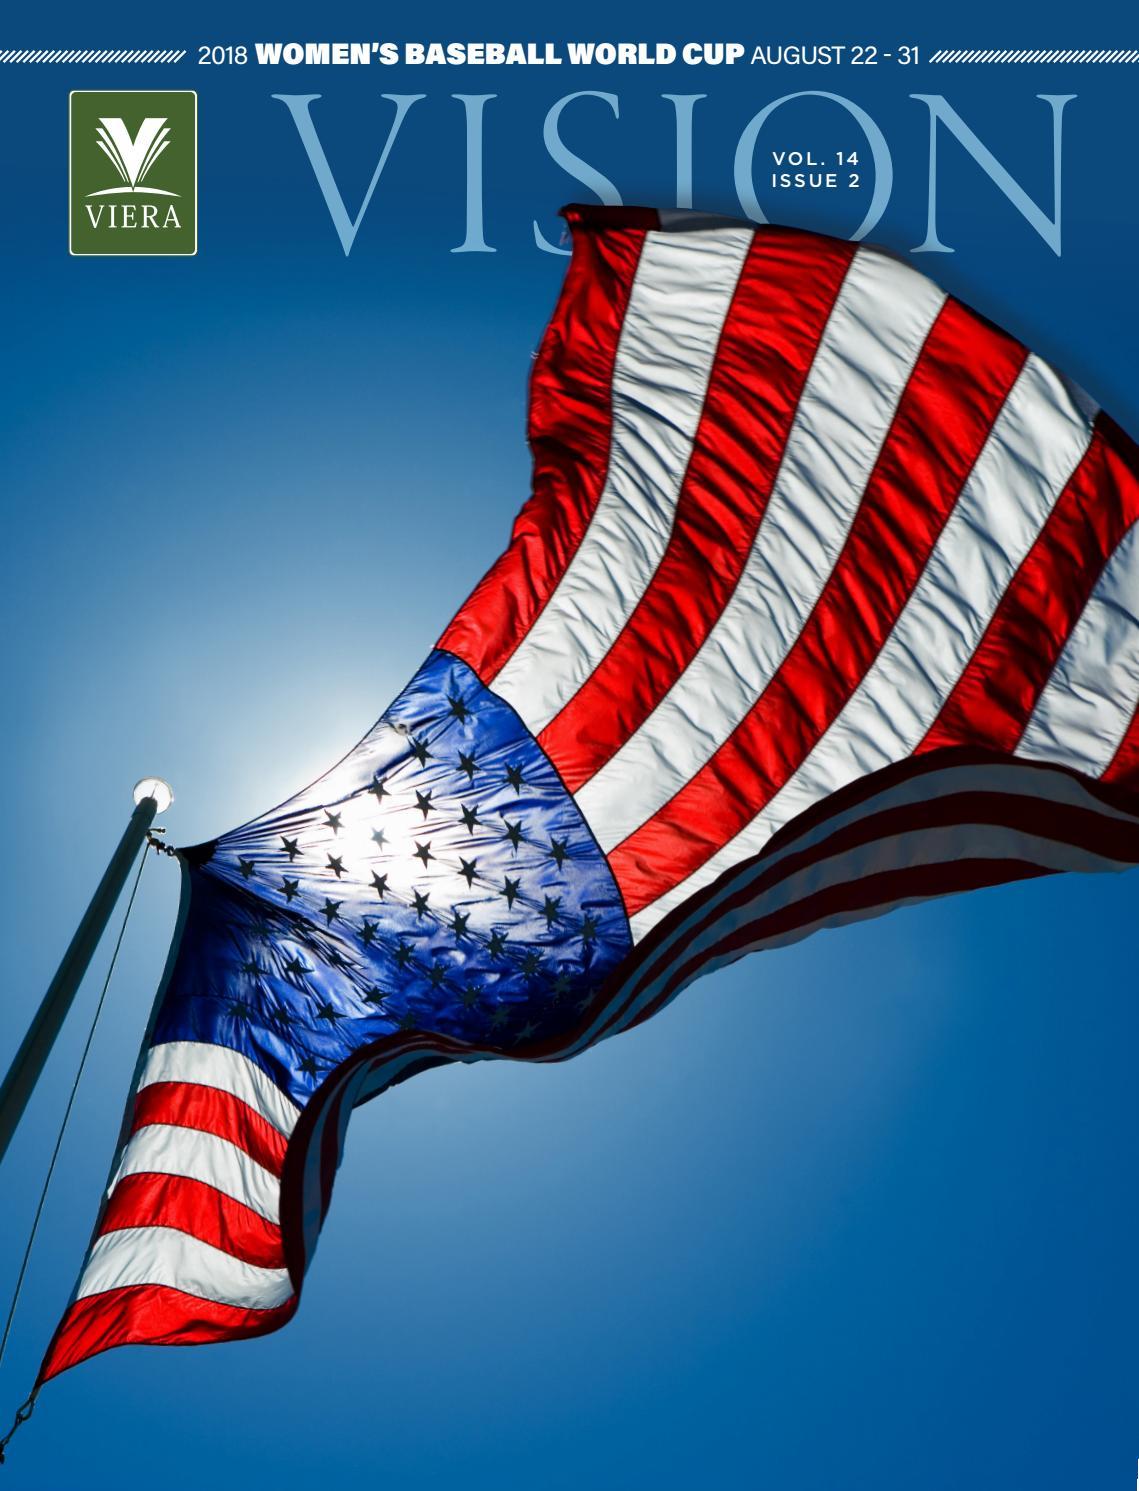 Viera Vision Volume 14, Issue 2 by The Viera Company/Viera